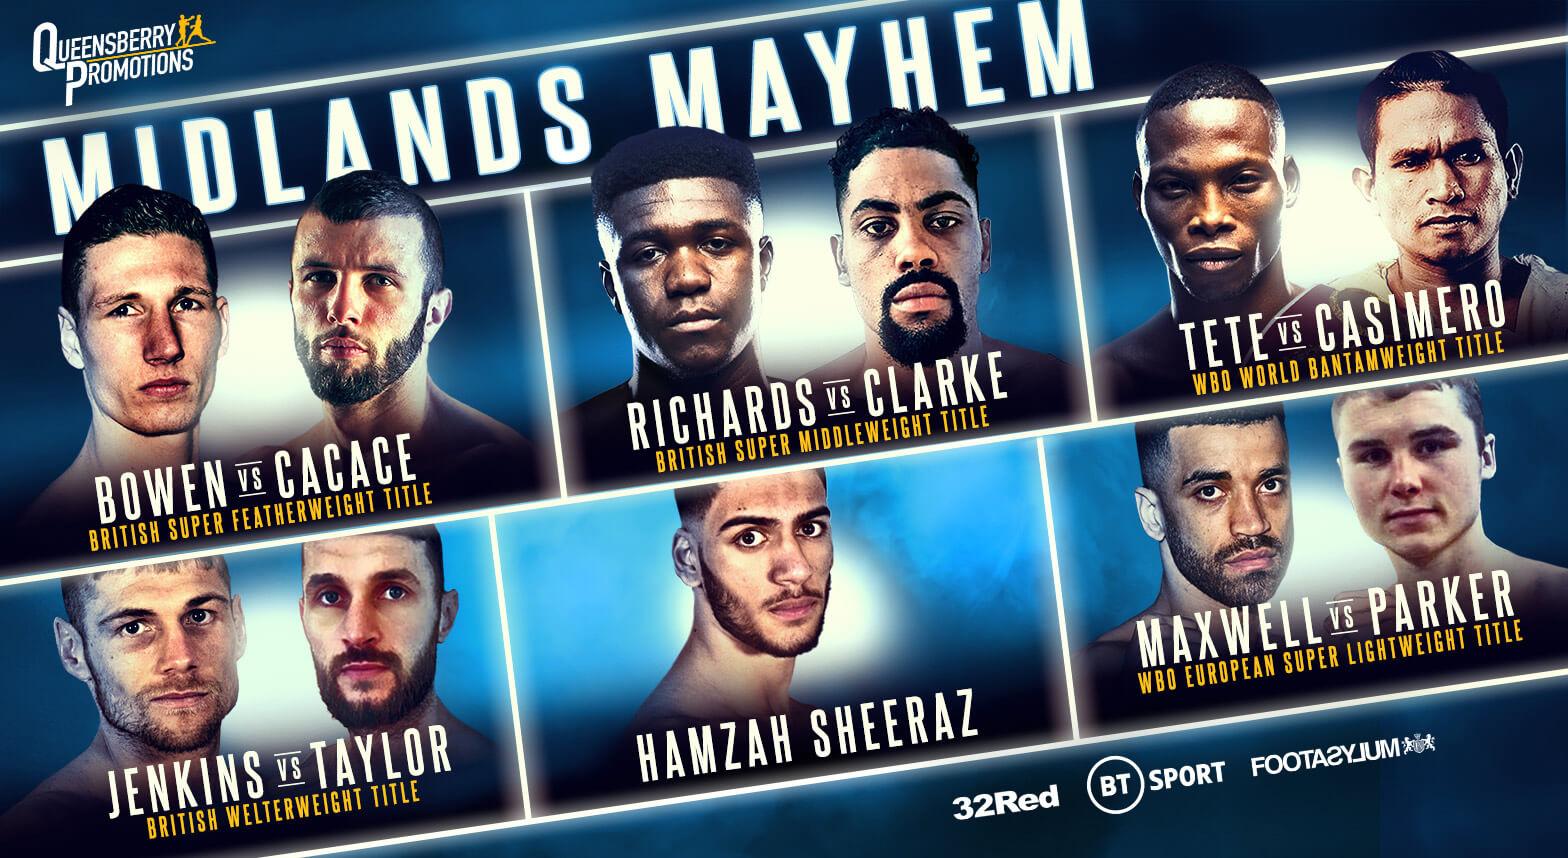 midlands-mayhem-arenasV2.jpg